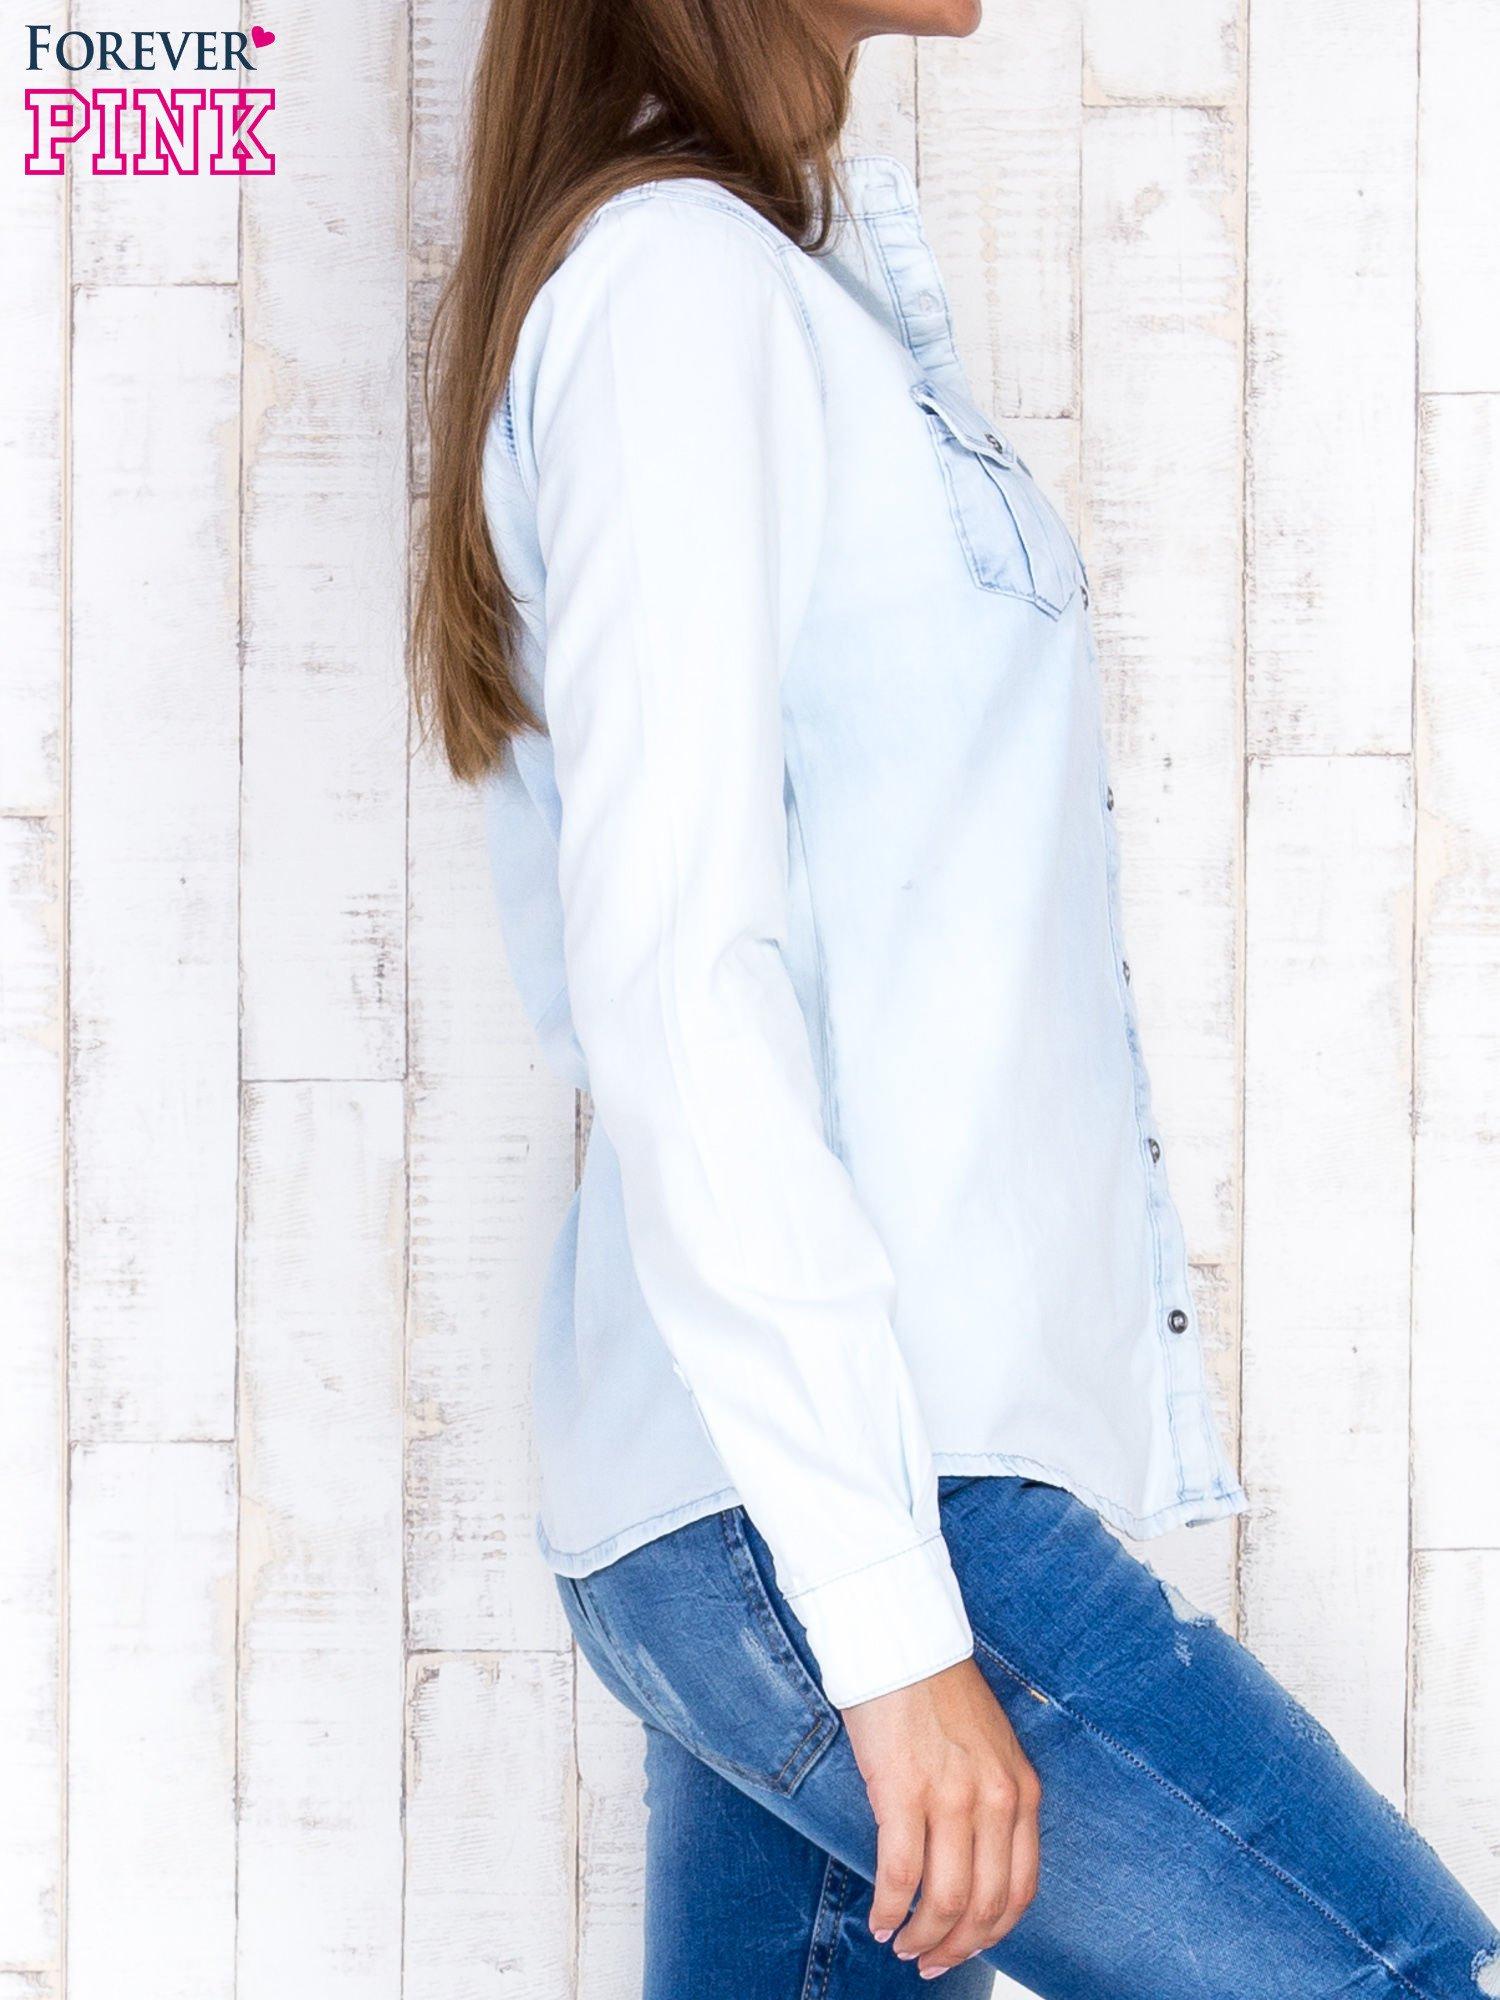 Jasnoniebieska damska koszula z jeansu                                  zdj.                                  3